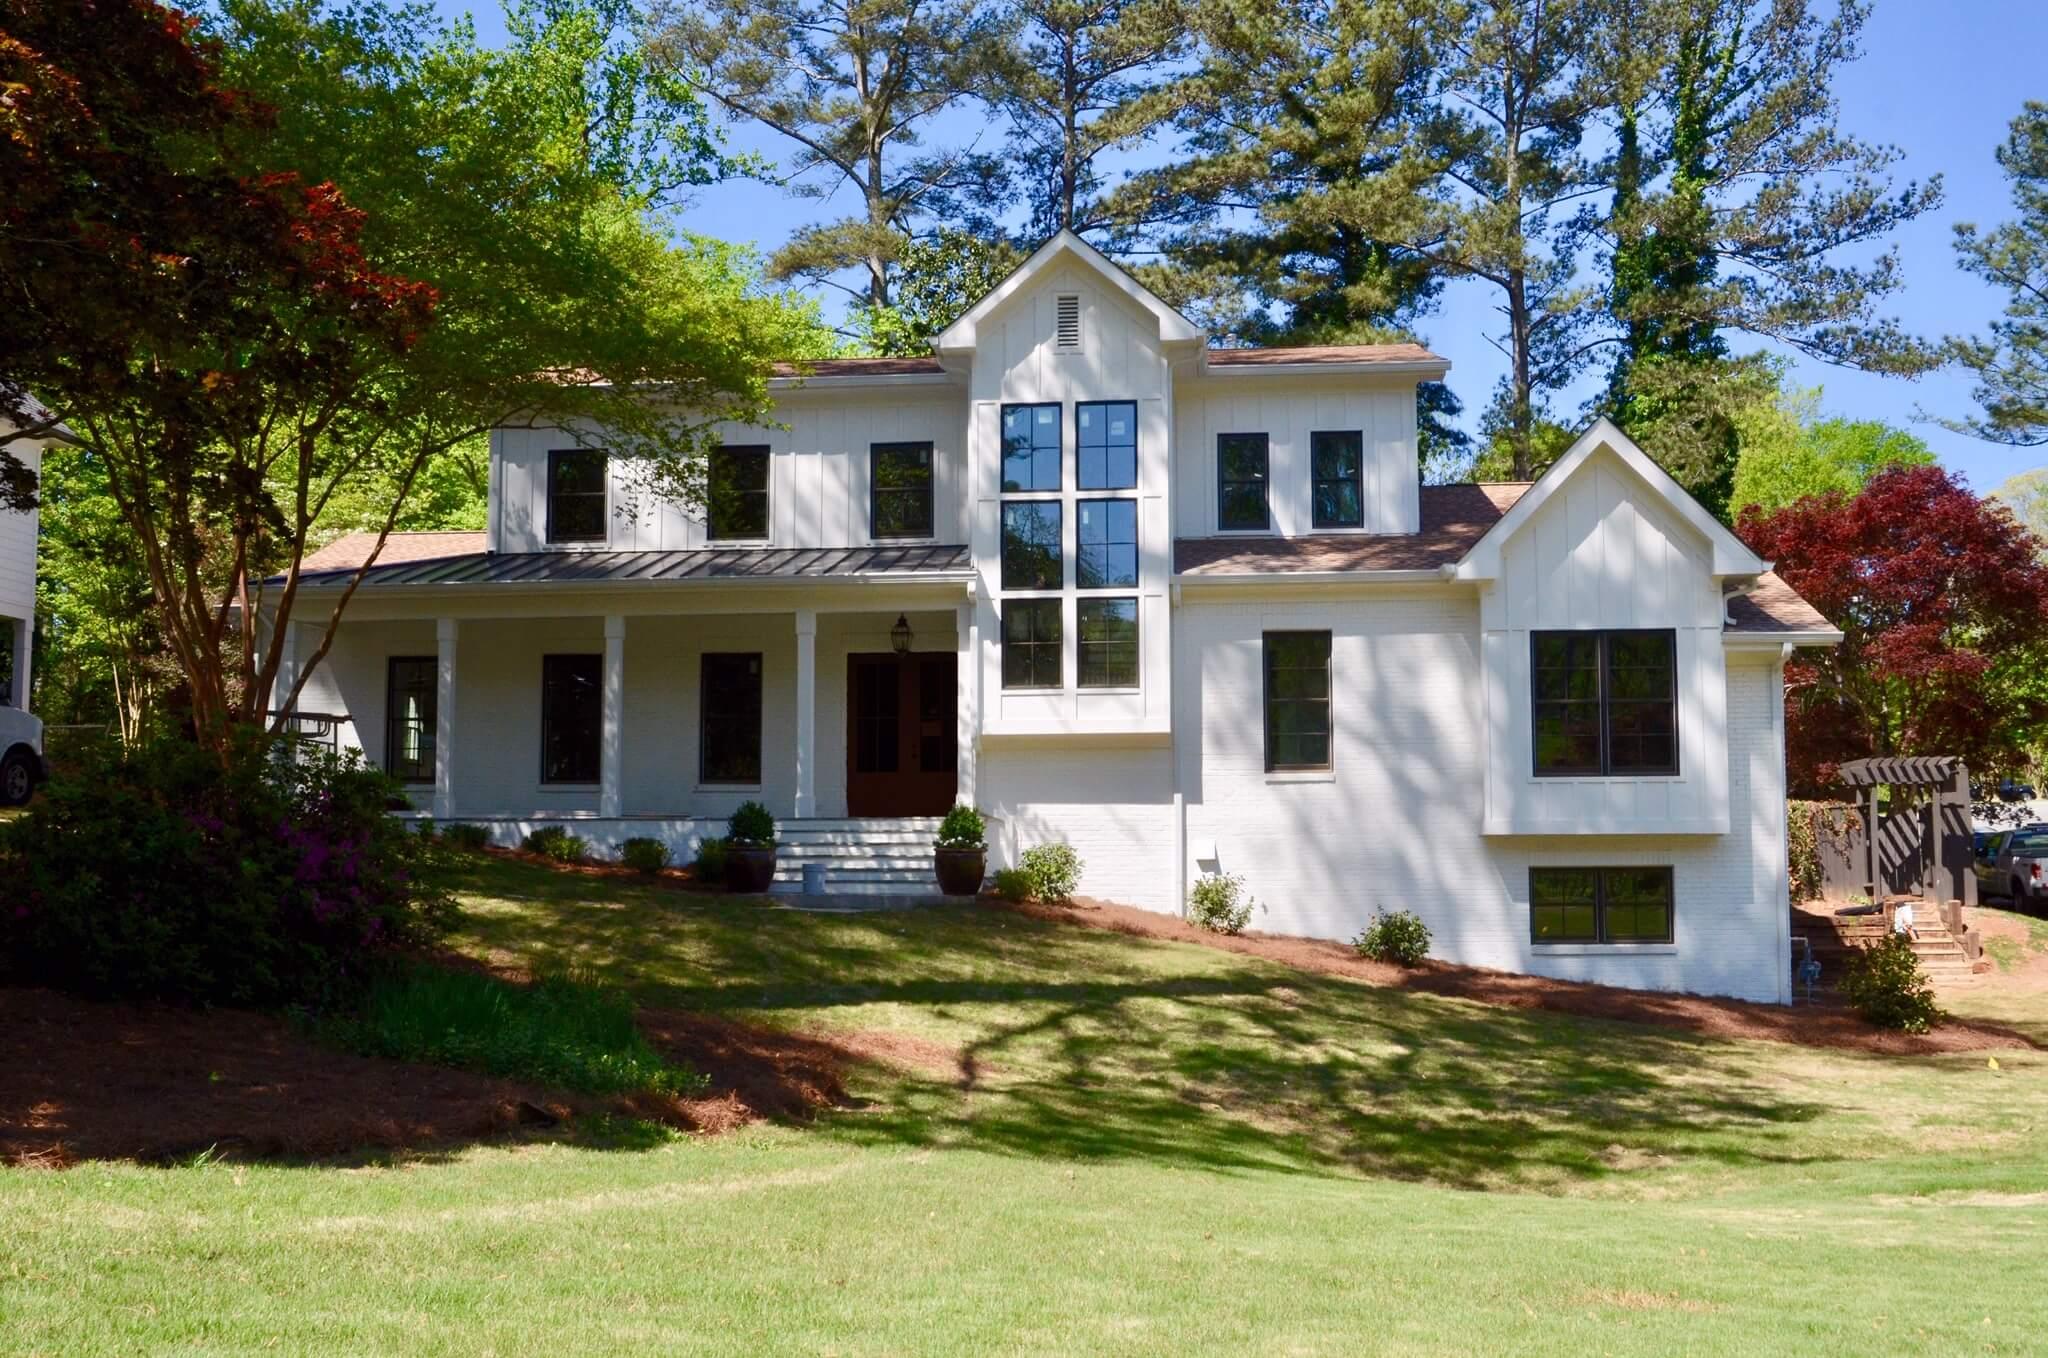 10 steps to build your custom home in Atlanta